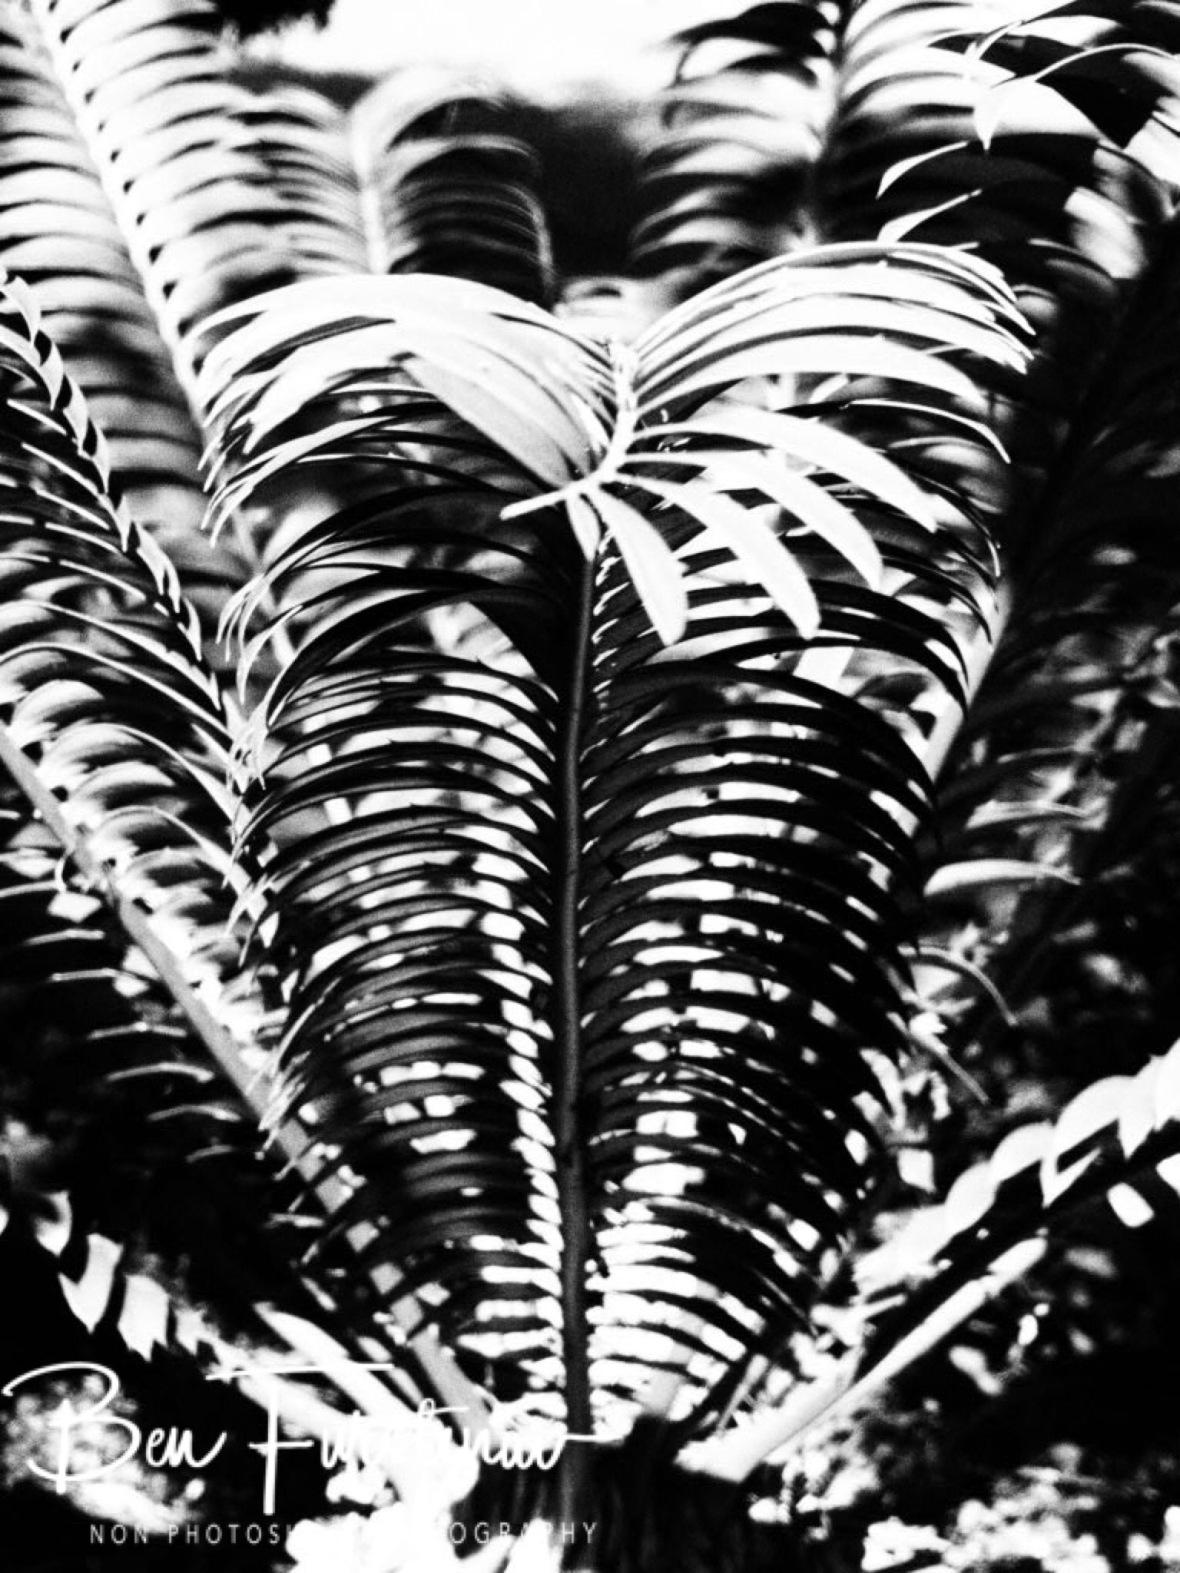 Shadow palms, Dundee